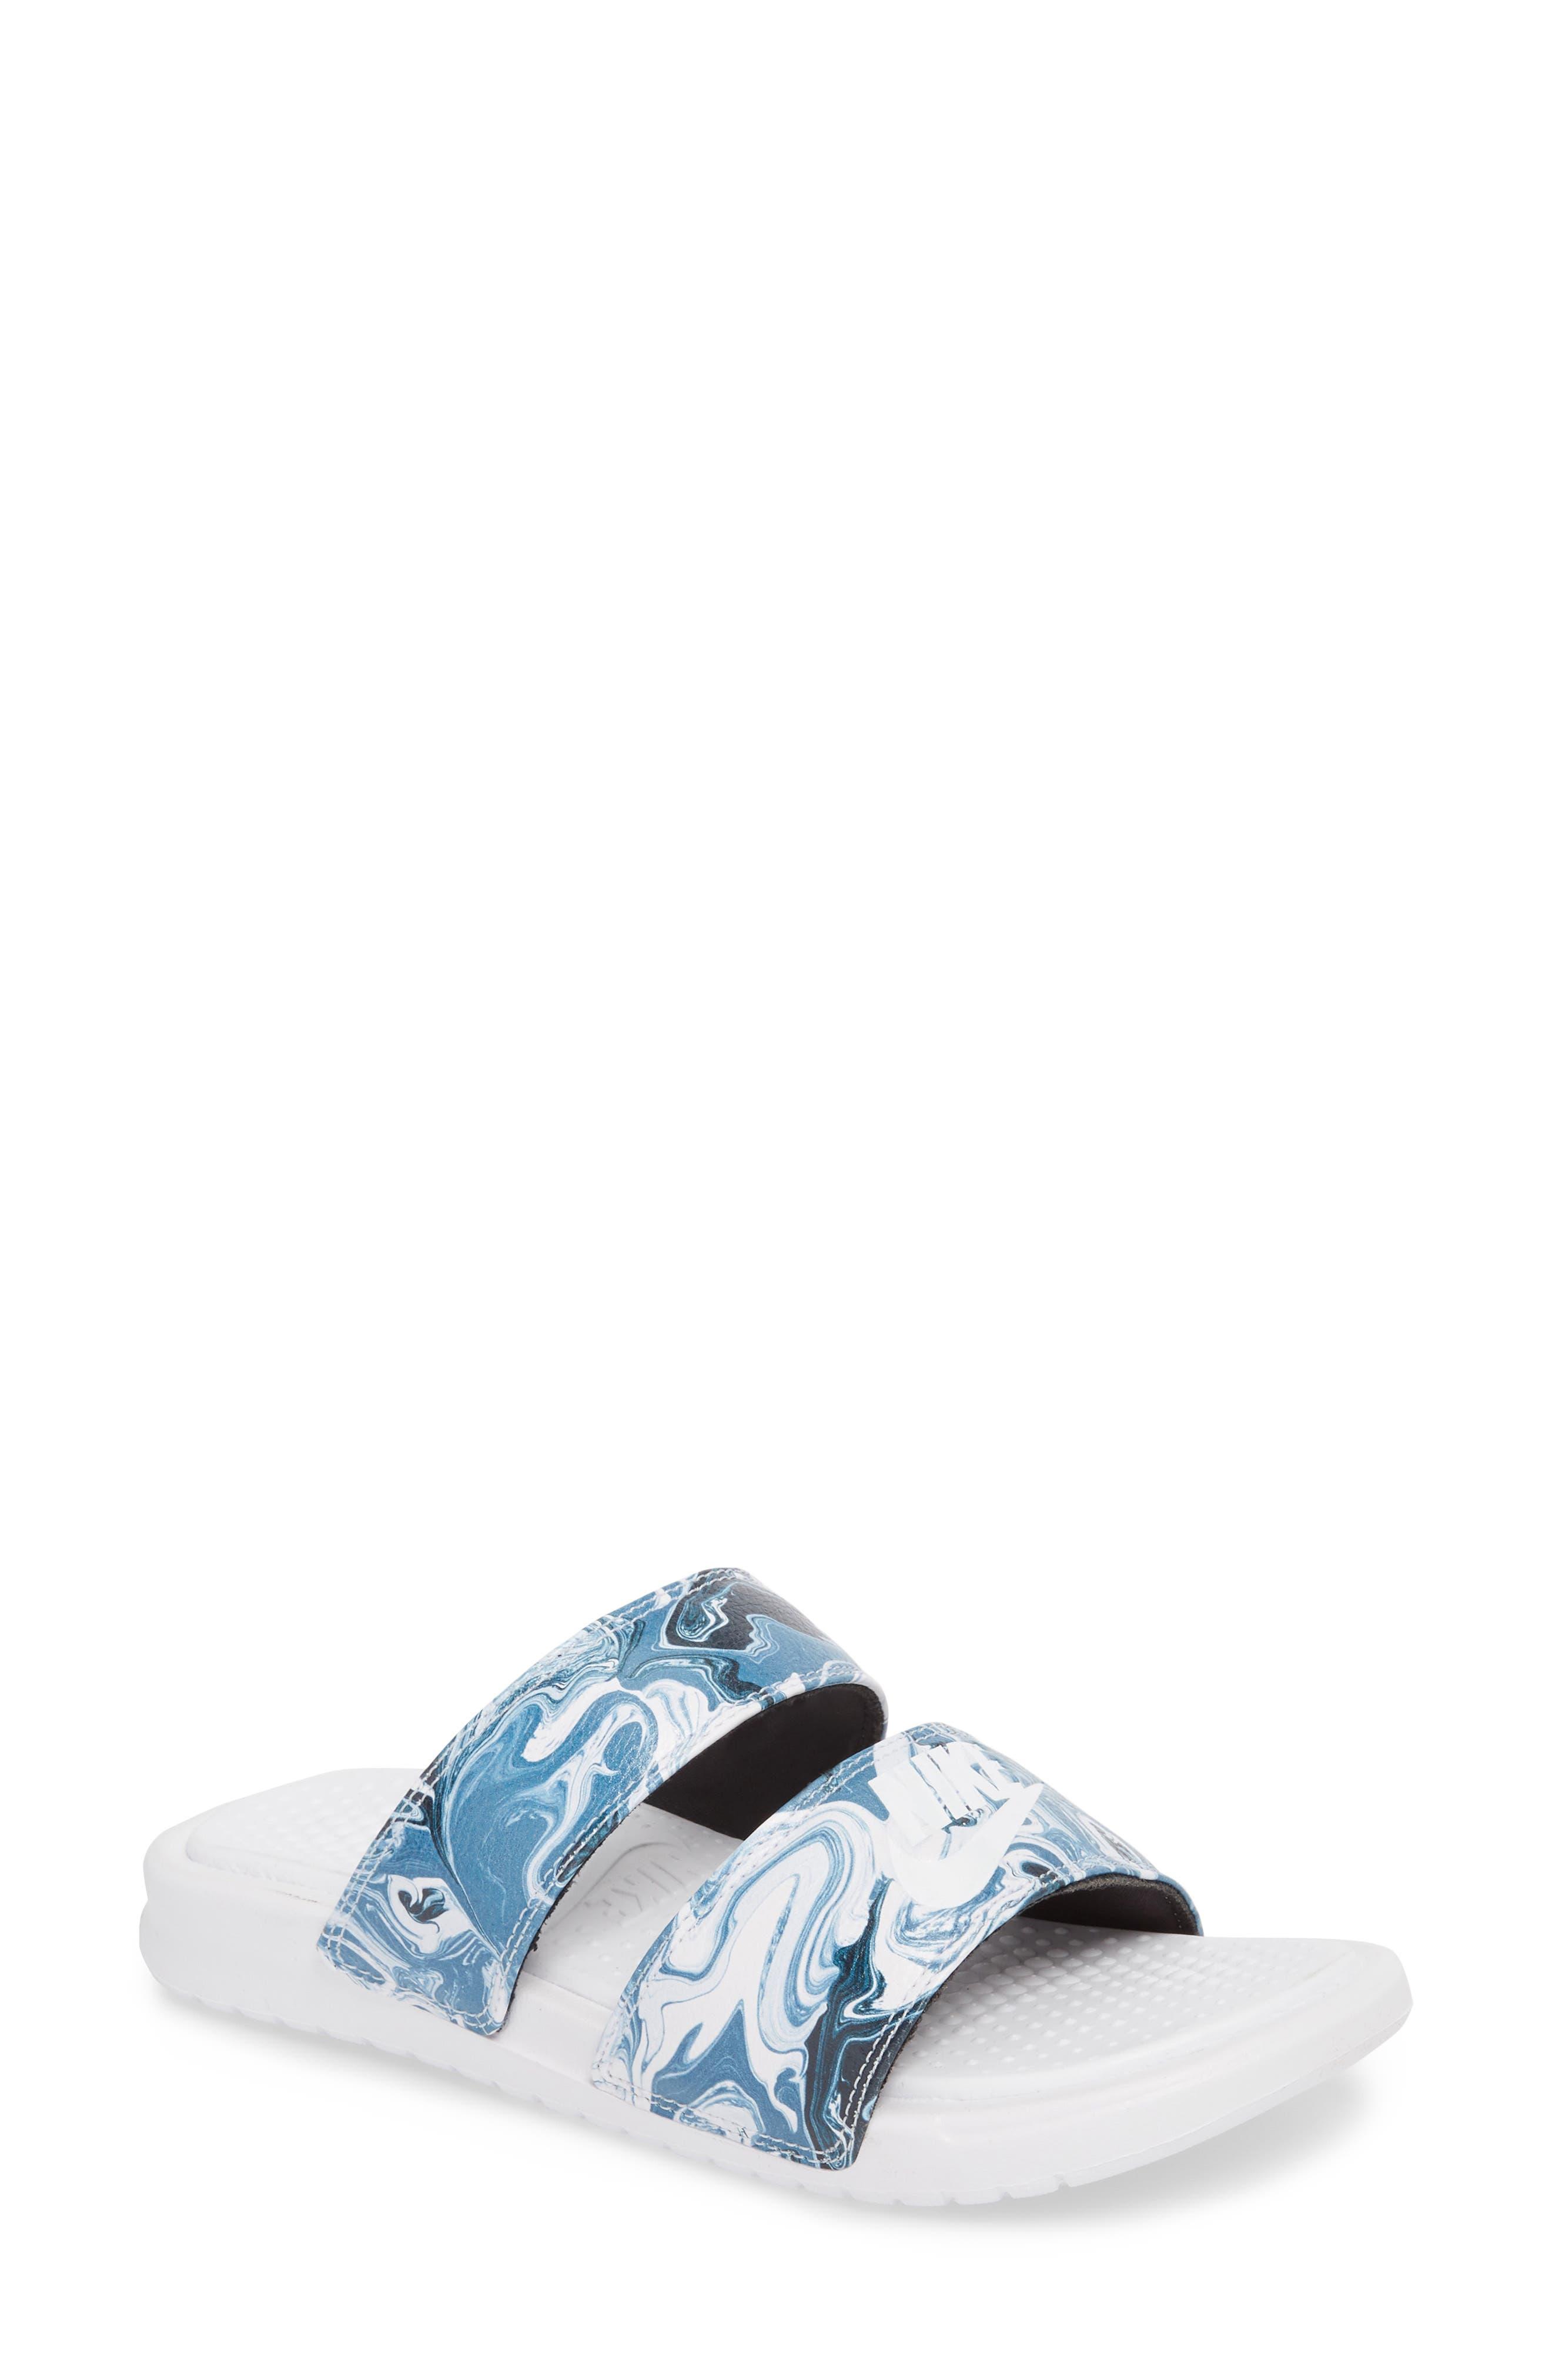 Benassi Duo Ultra Slide Sandal,                             Main thumbnail 1, color,                             BLACK/ WHITE